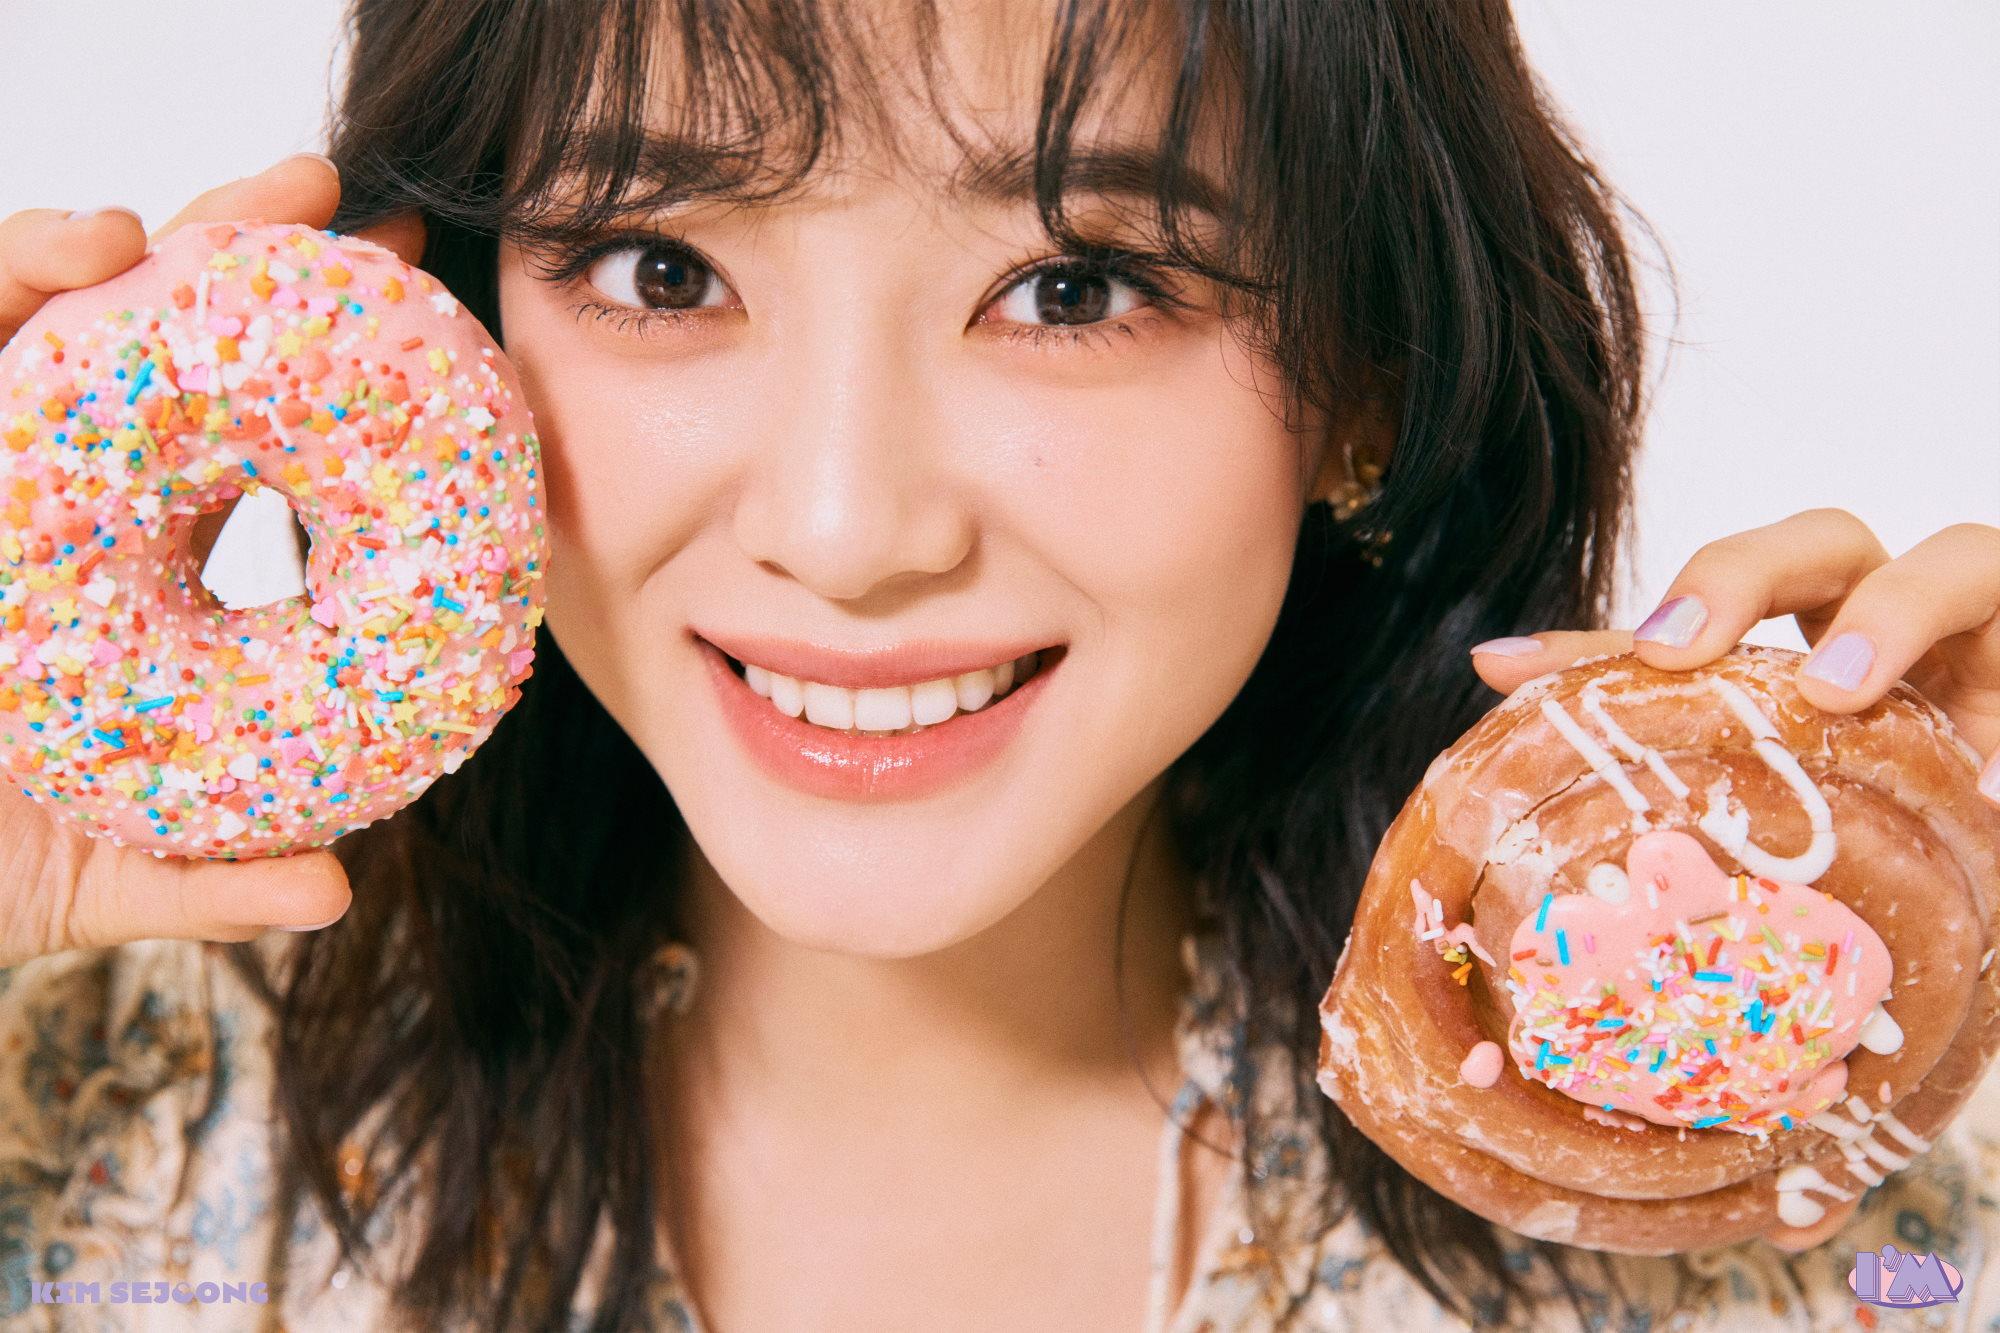 Kim Sejeong Profile